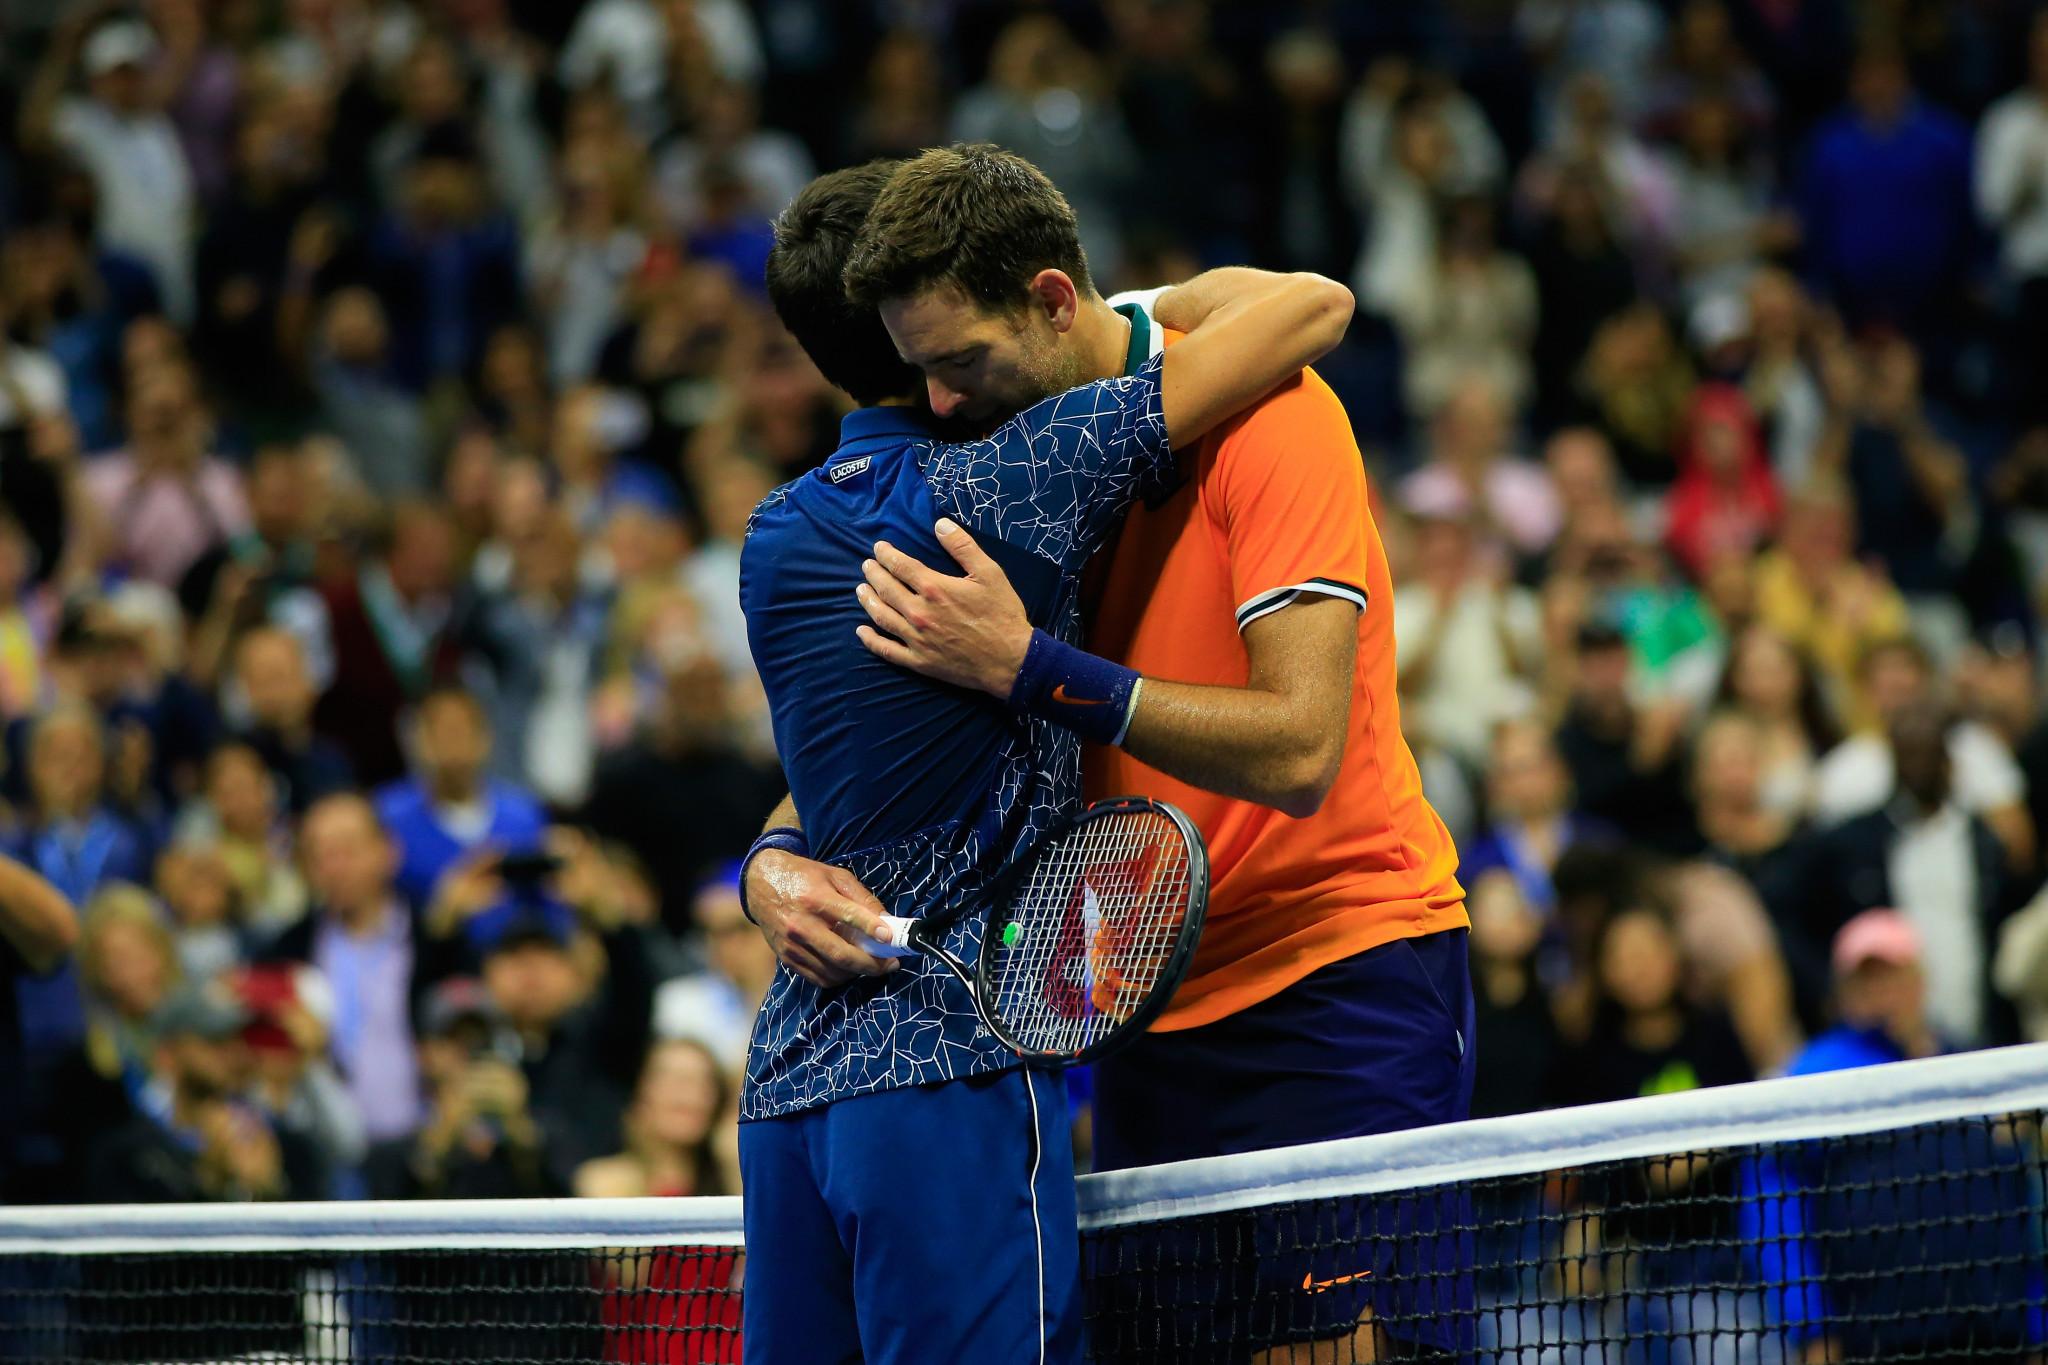 Djokovic clinches 14th Grand Slam title with victory over Del Potro at US Open